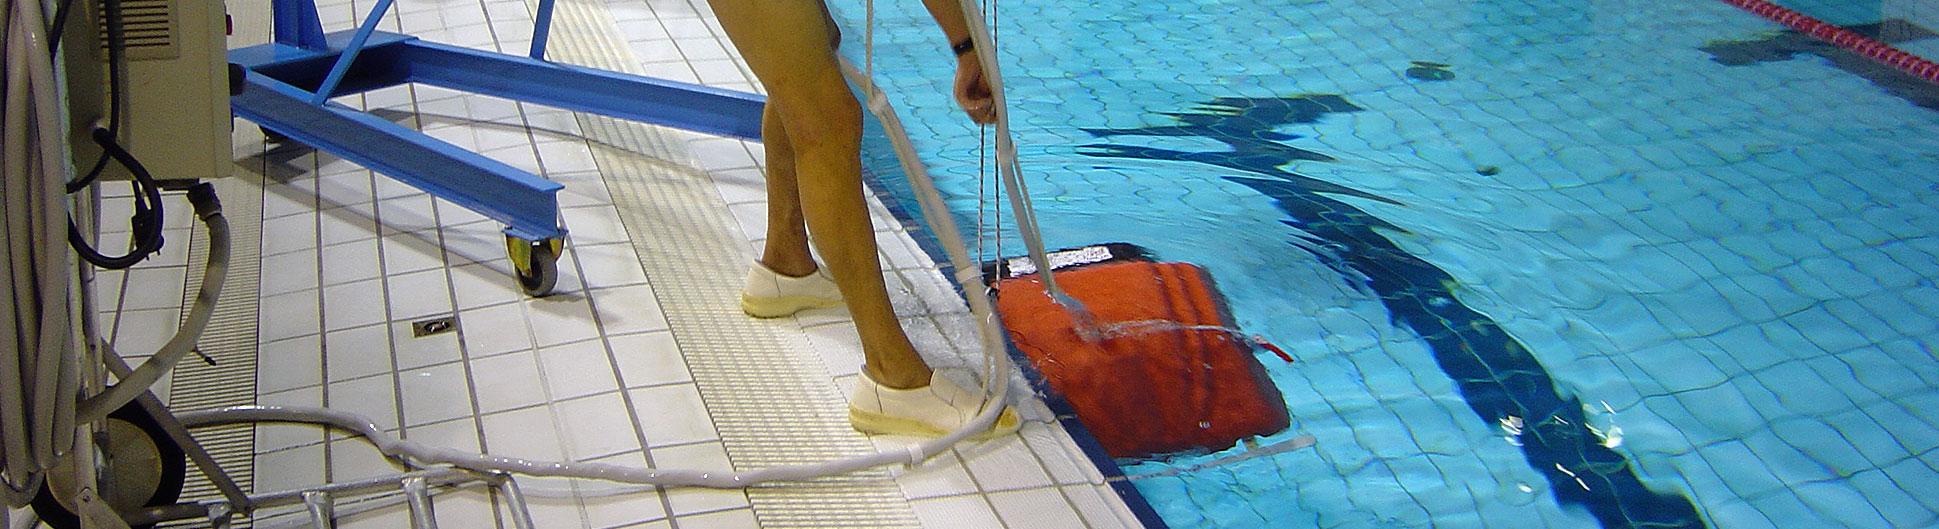 nettoyage-piscine